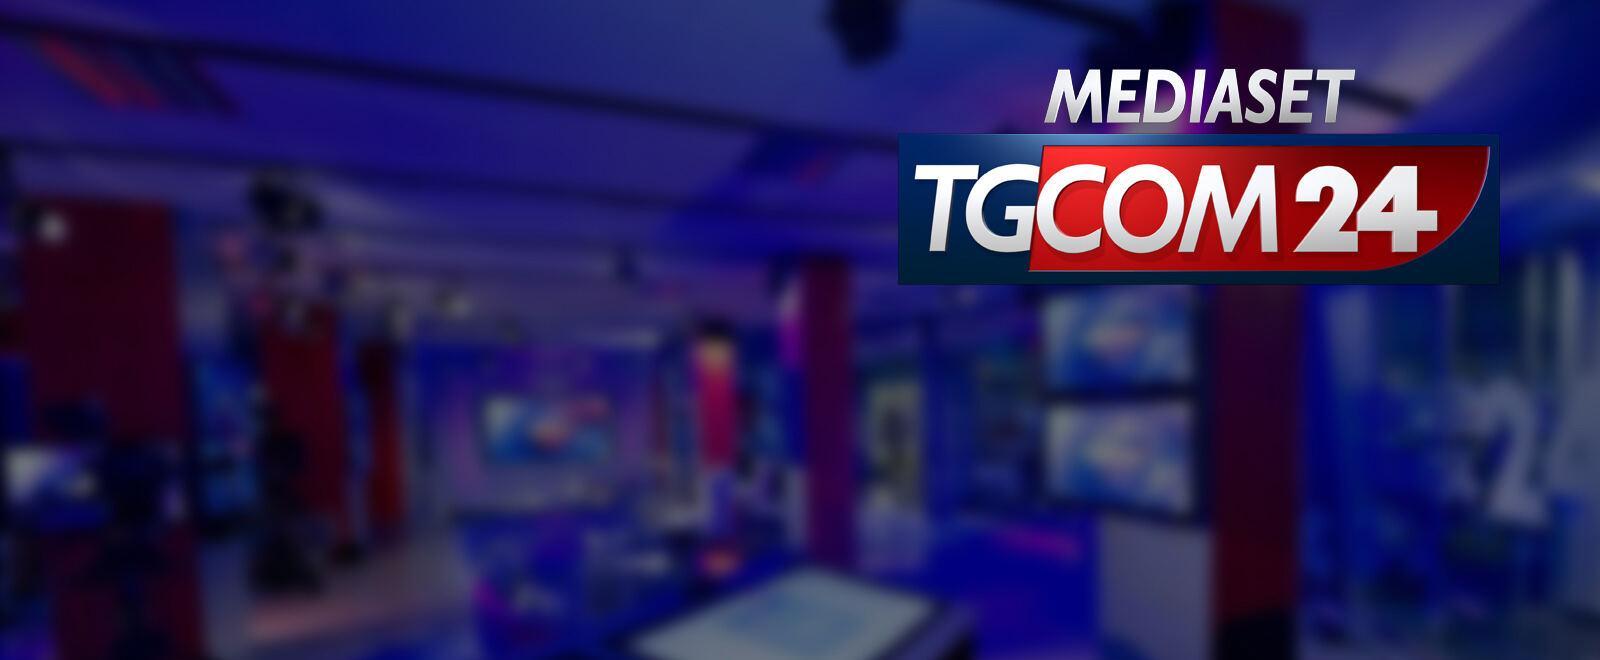 Tgcom24